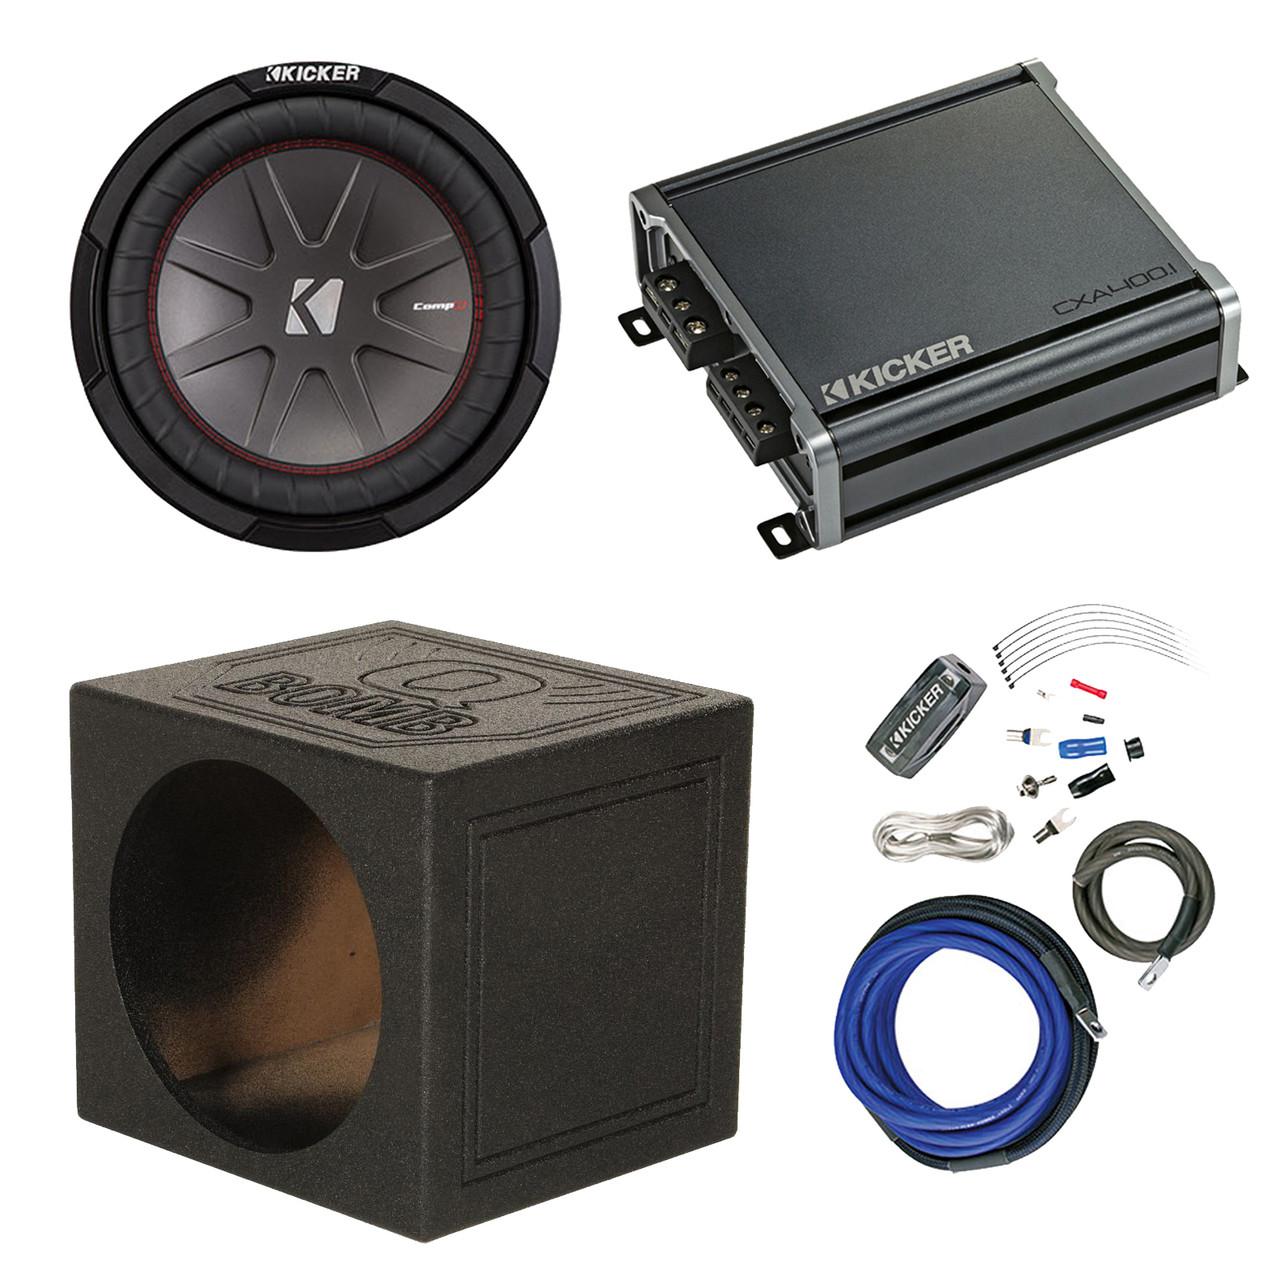 kicker 10 4 ohm car audio subwoofer 600 watt amp 10 sub box amp wiring kit r 43cwr104 1 43cxa3001 road entertainment [ 1280 x 1280 Pixel ]